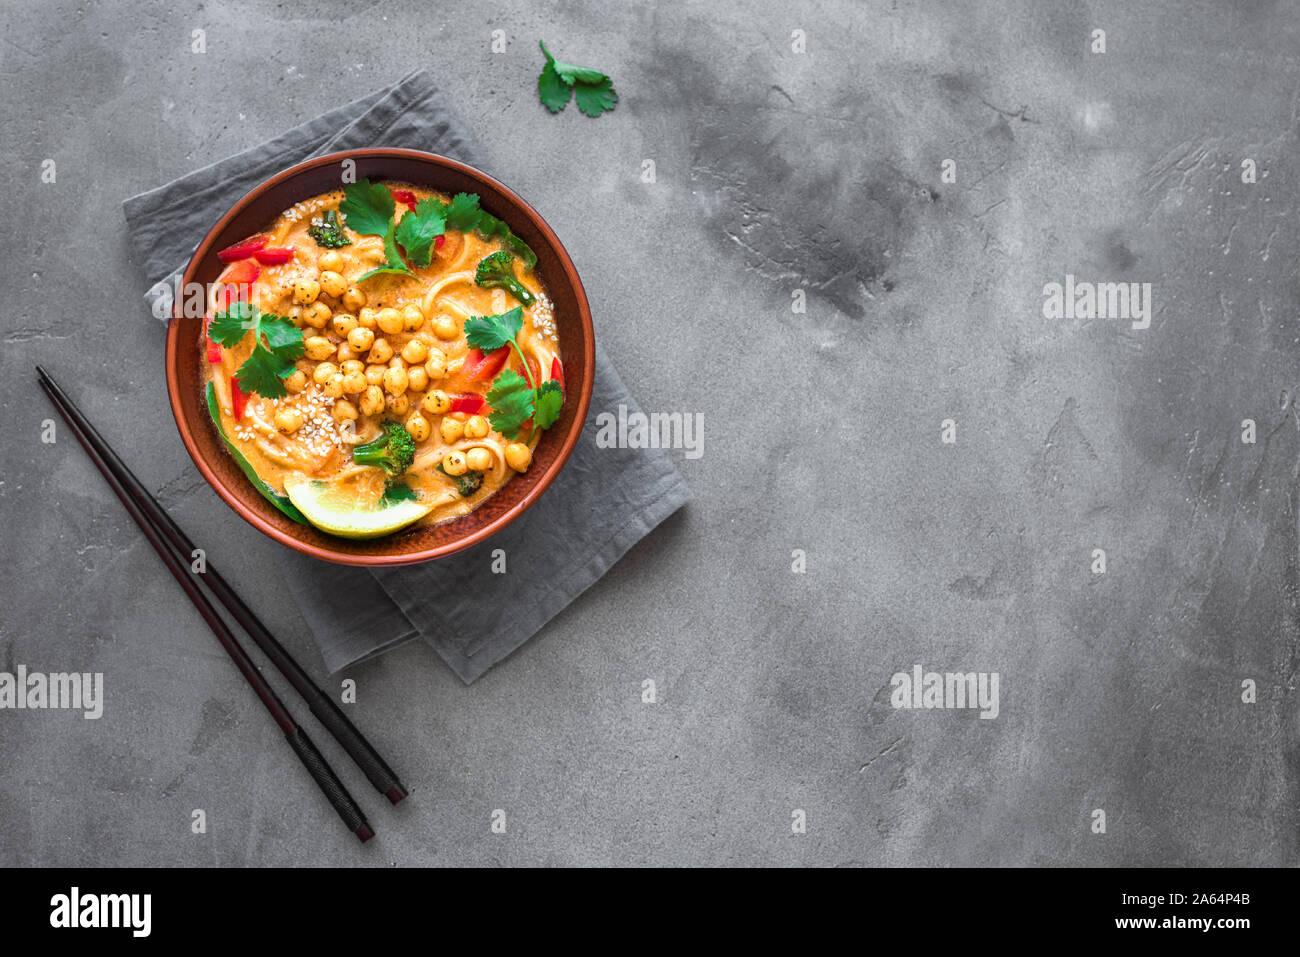 Vegetarian Laksa Soup Vegetable Noodle Laksa Soup On Black Background Top View Copy Space Asian Malaysian Vegan Vegetarian Food Stock Photo Alamy